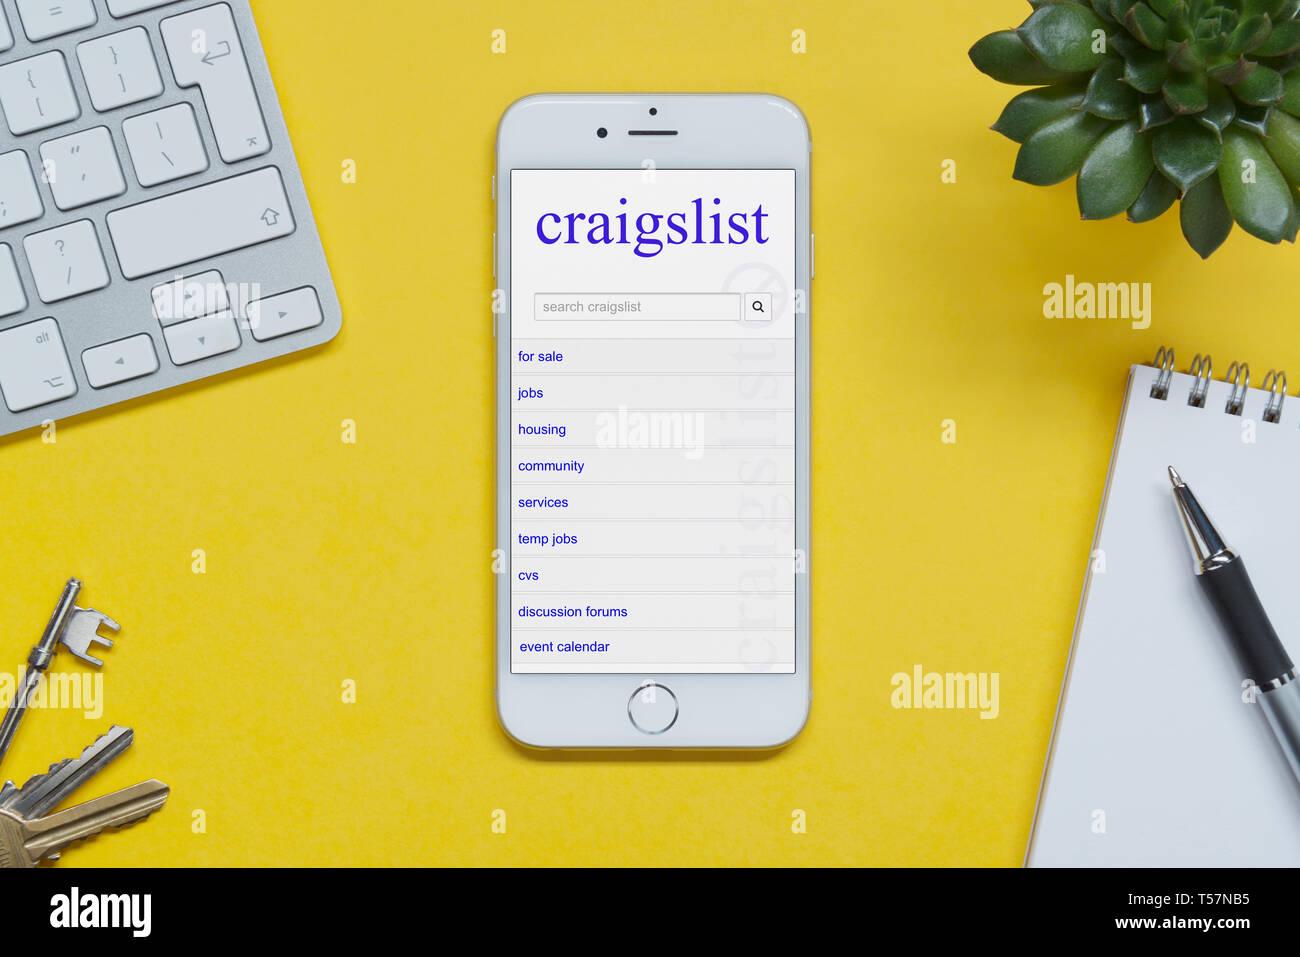 Craigslist Stock Photos & Craigslist Stock Images - Alamy